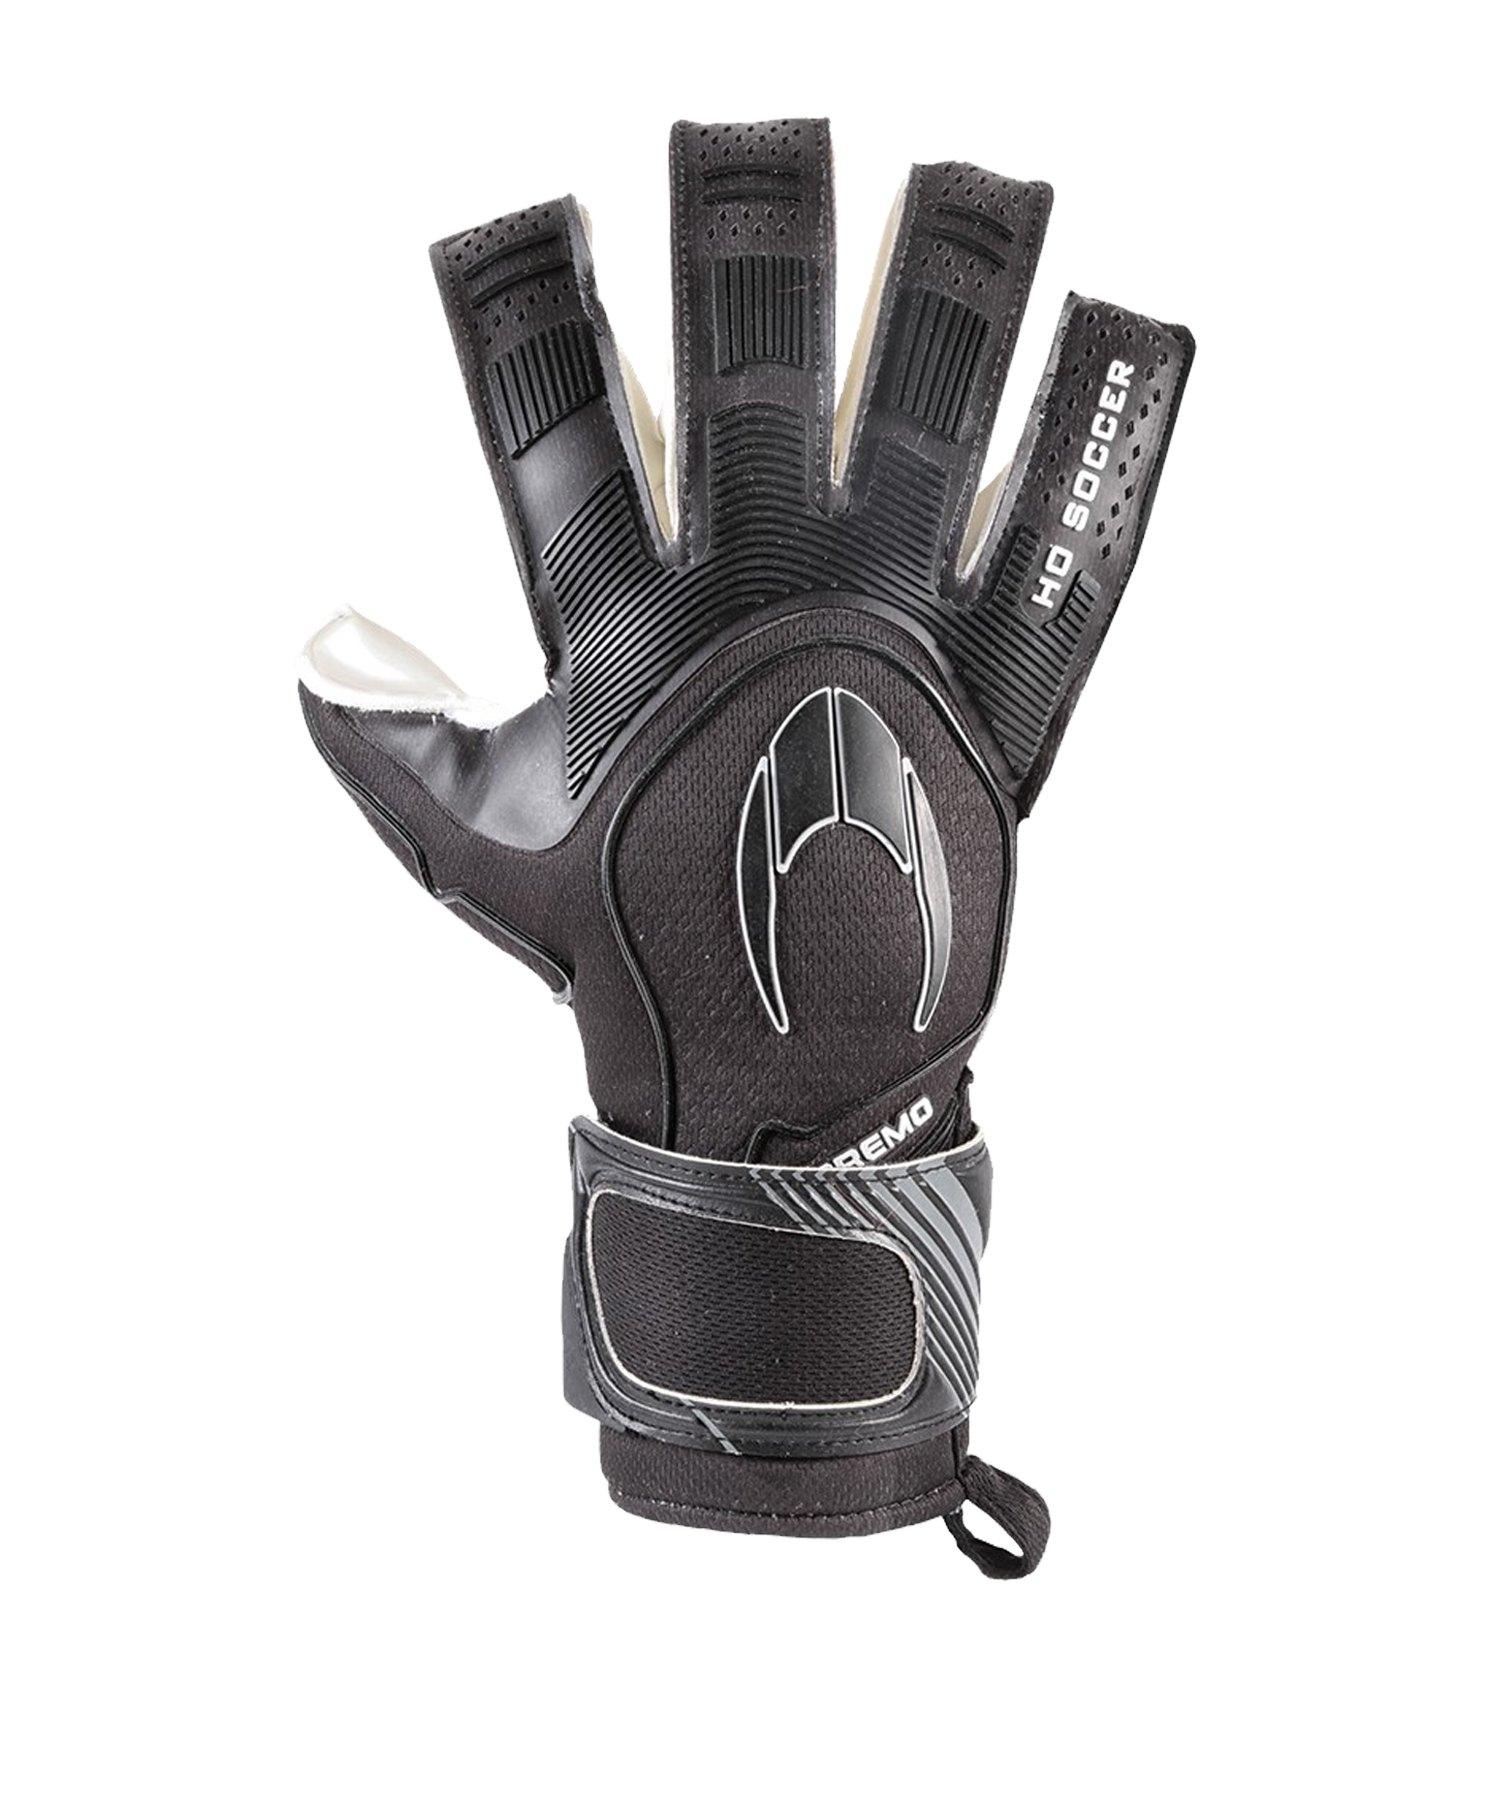 HO Soccer SSG Supremo 2 Roll TW-Handschuhe Schwarz - schwarz